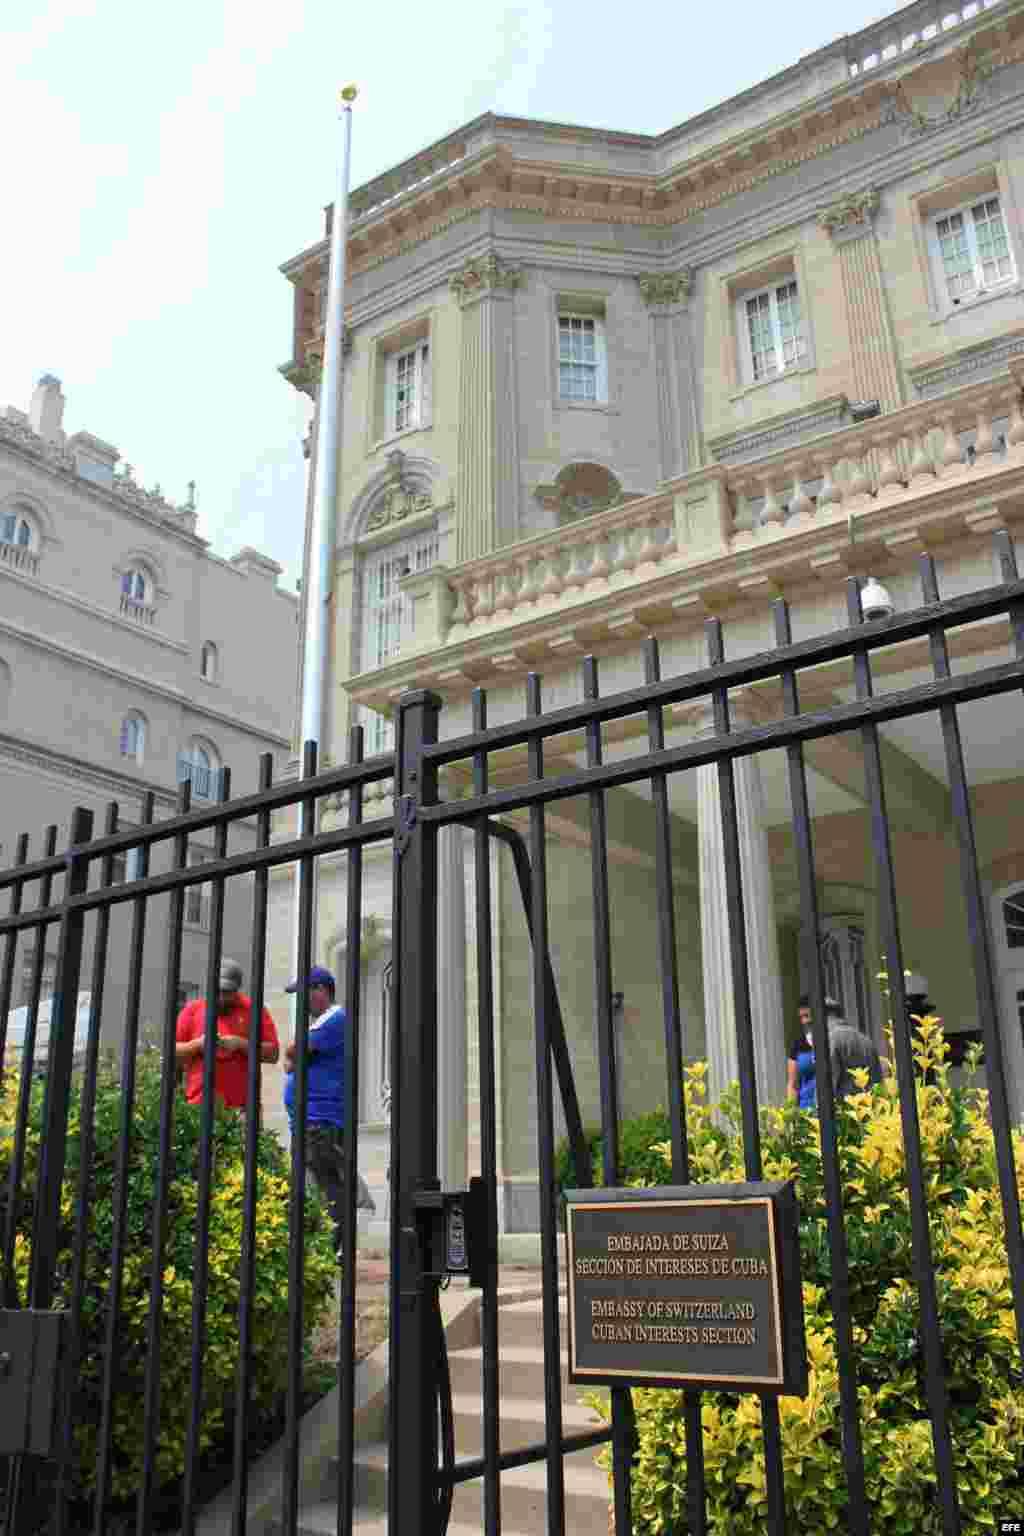 Ya hay mástil para la bandera cubana en la futura embajada de Cuba.